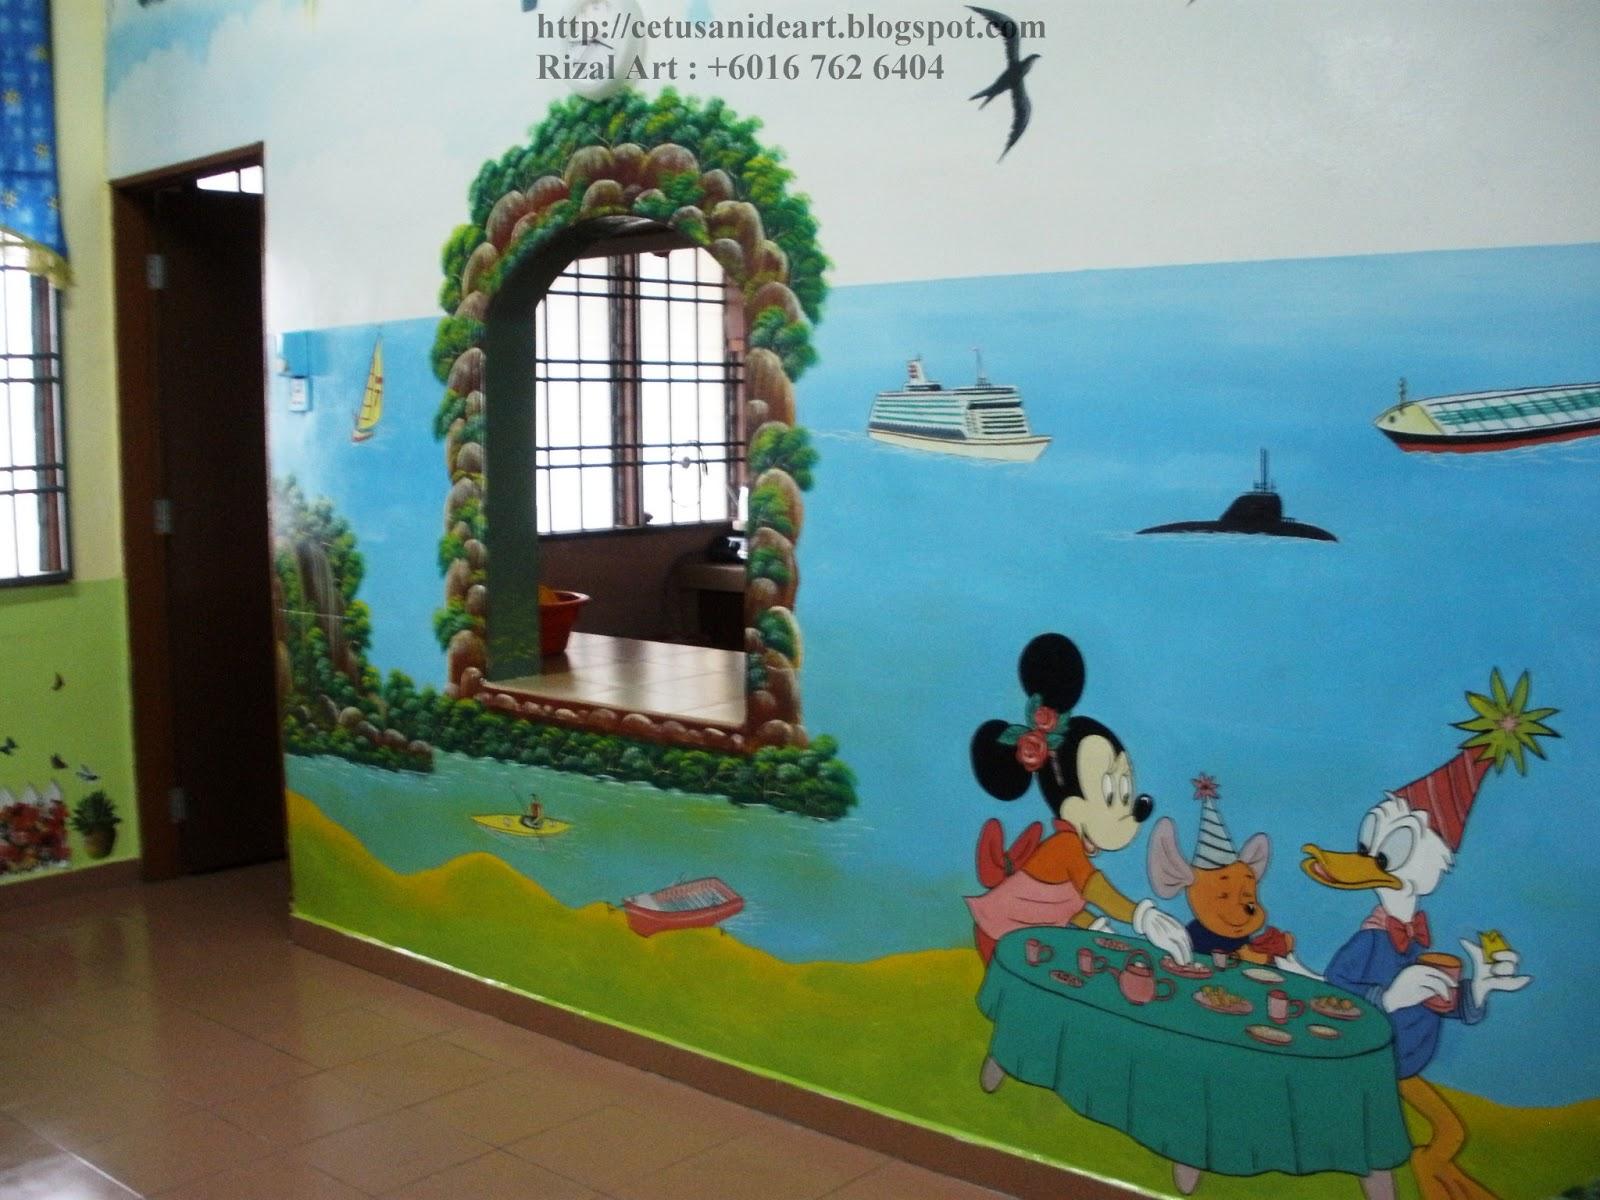 Mural art cetusan idea february 2013 for Mural tadika